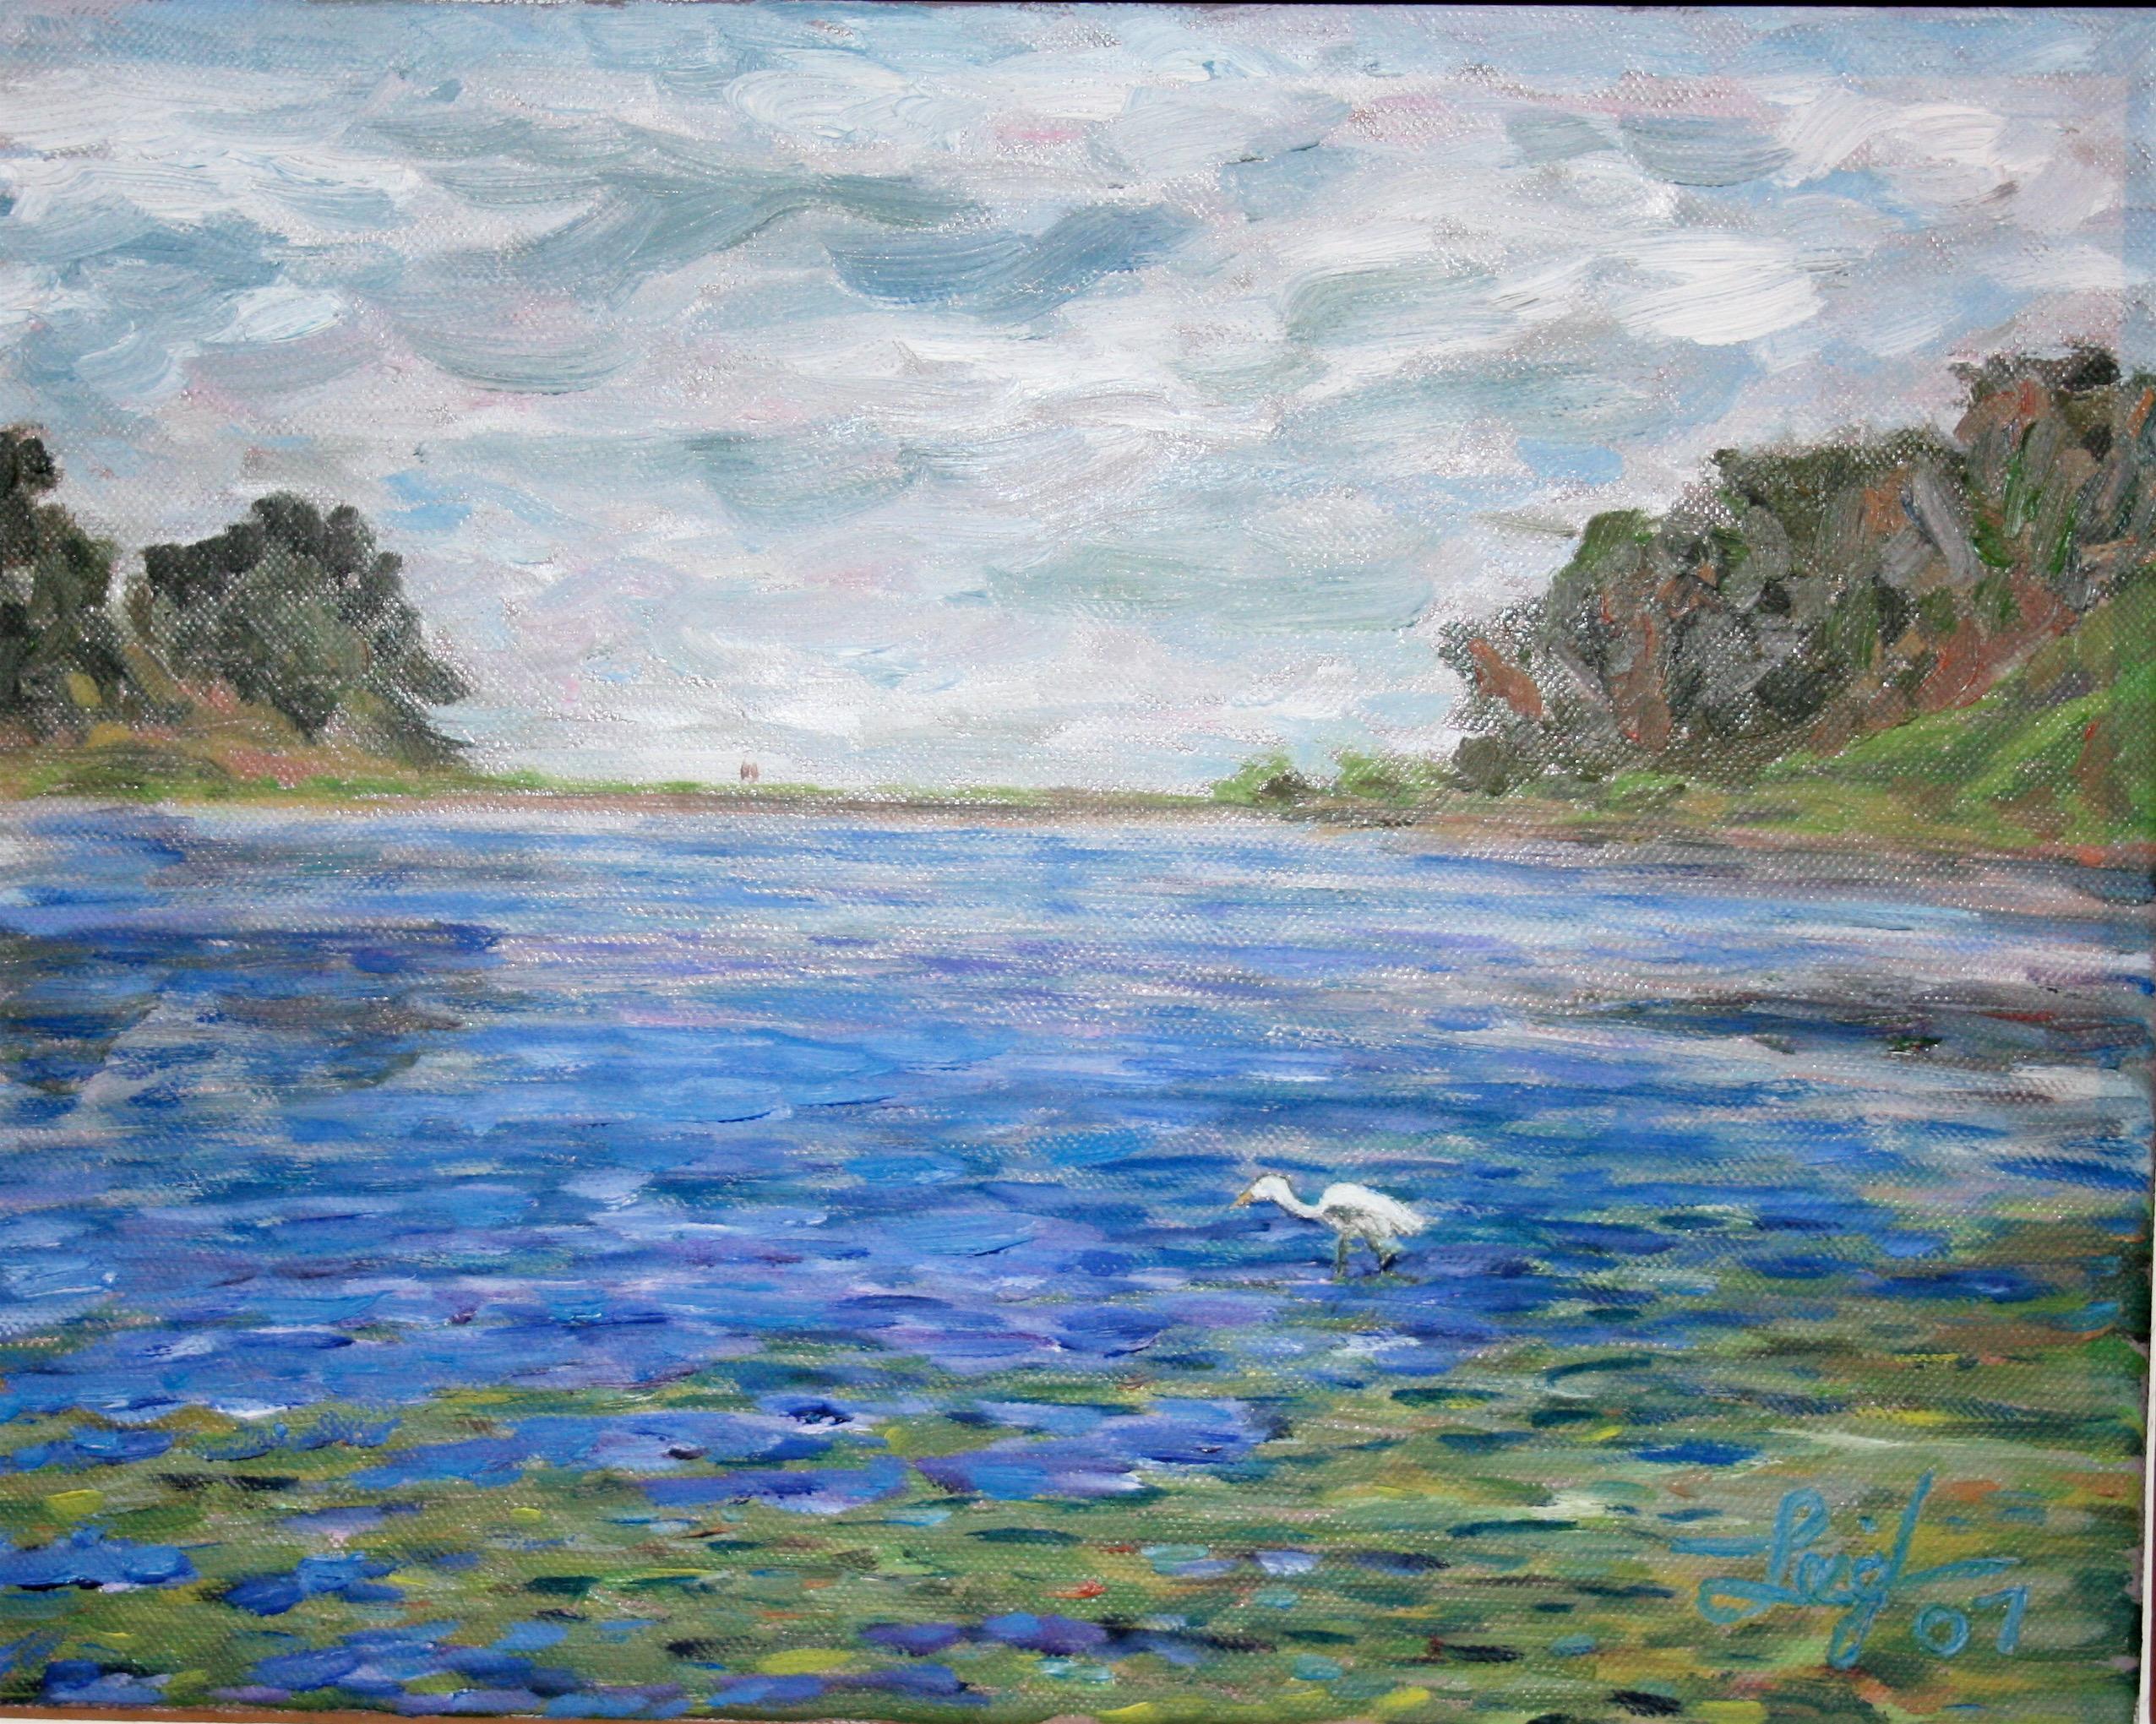 UCSB Lagoon #2  ~   Ameila Eastman & Brian Pickett, Houston, TX 2007  •  14 x 11